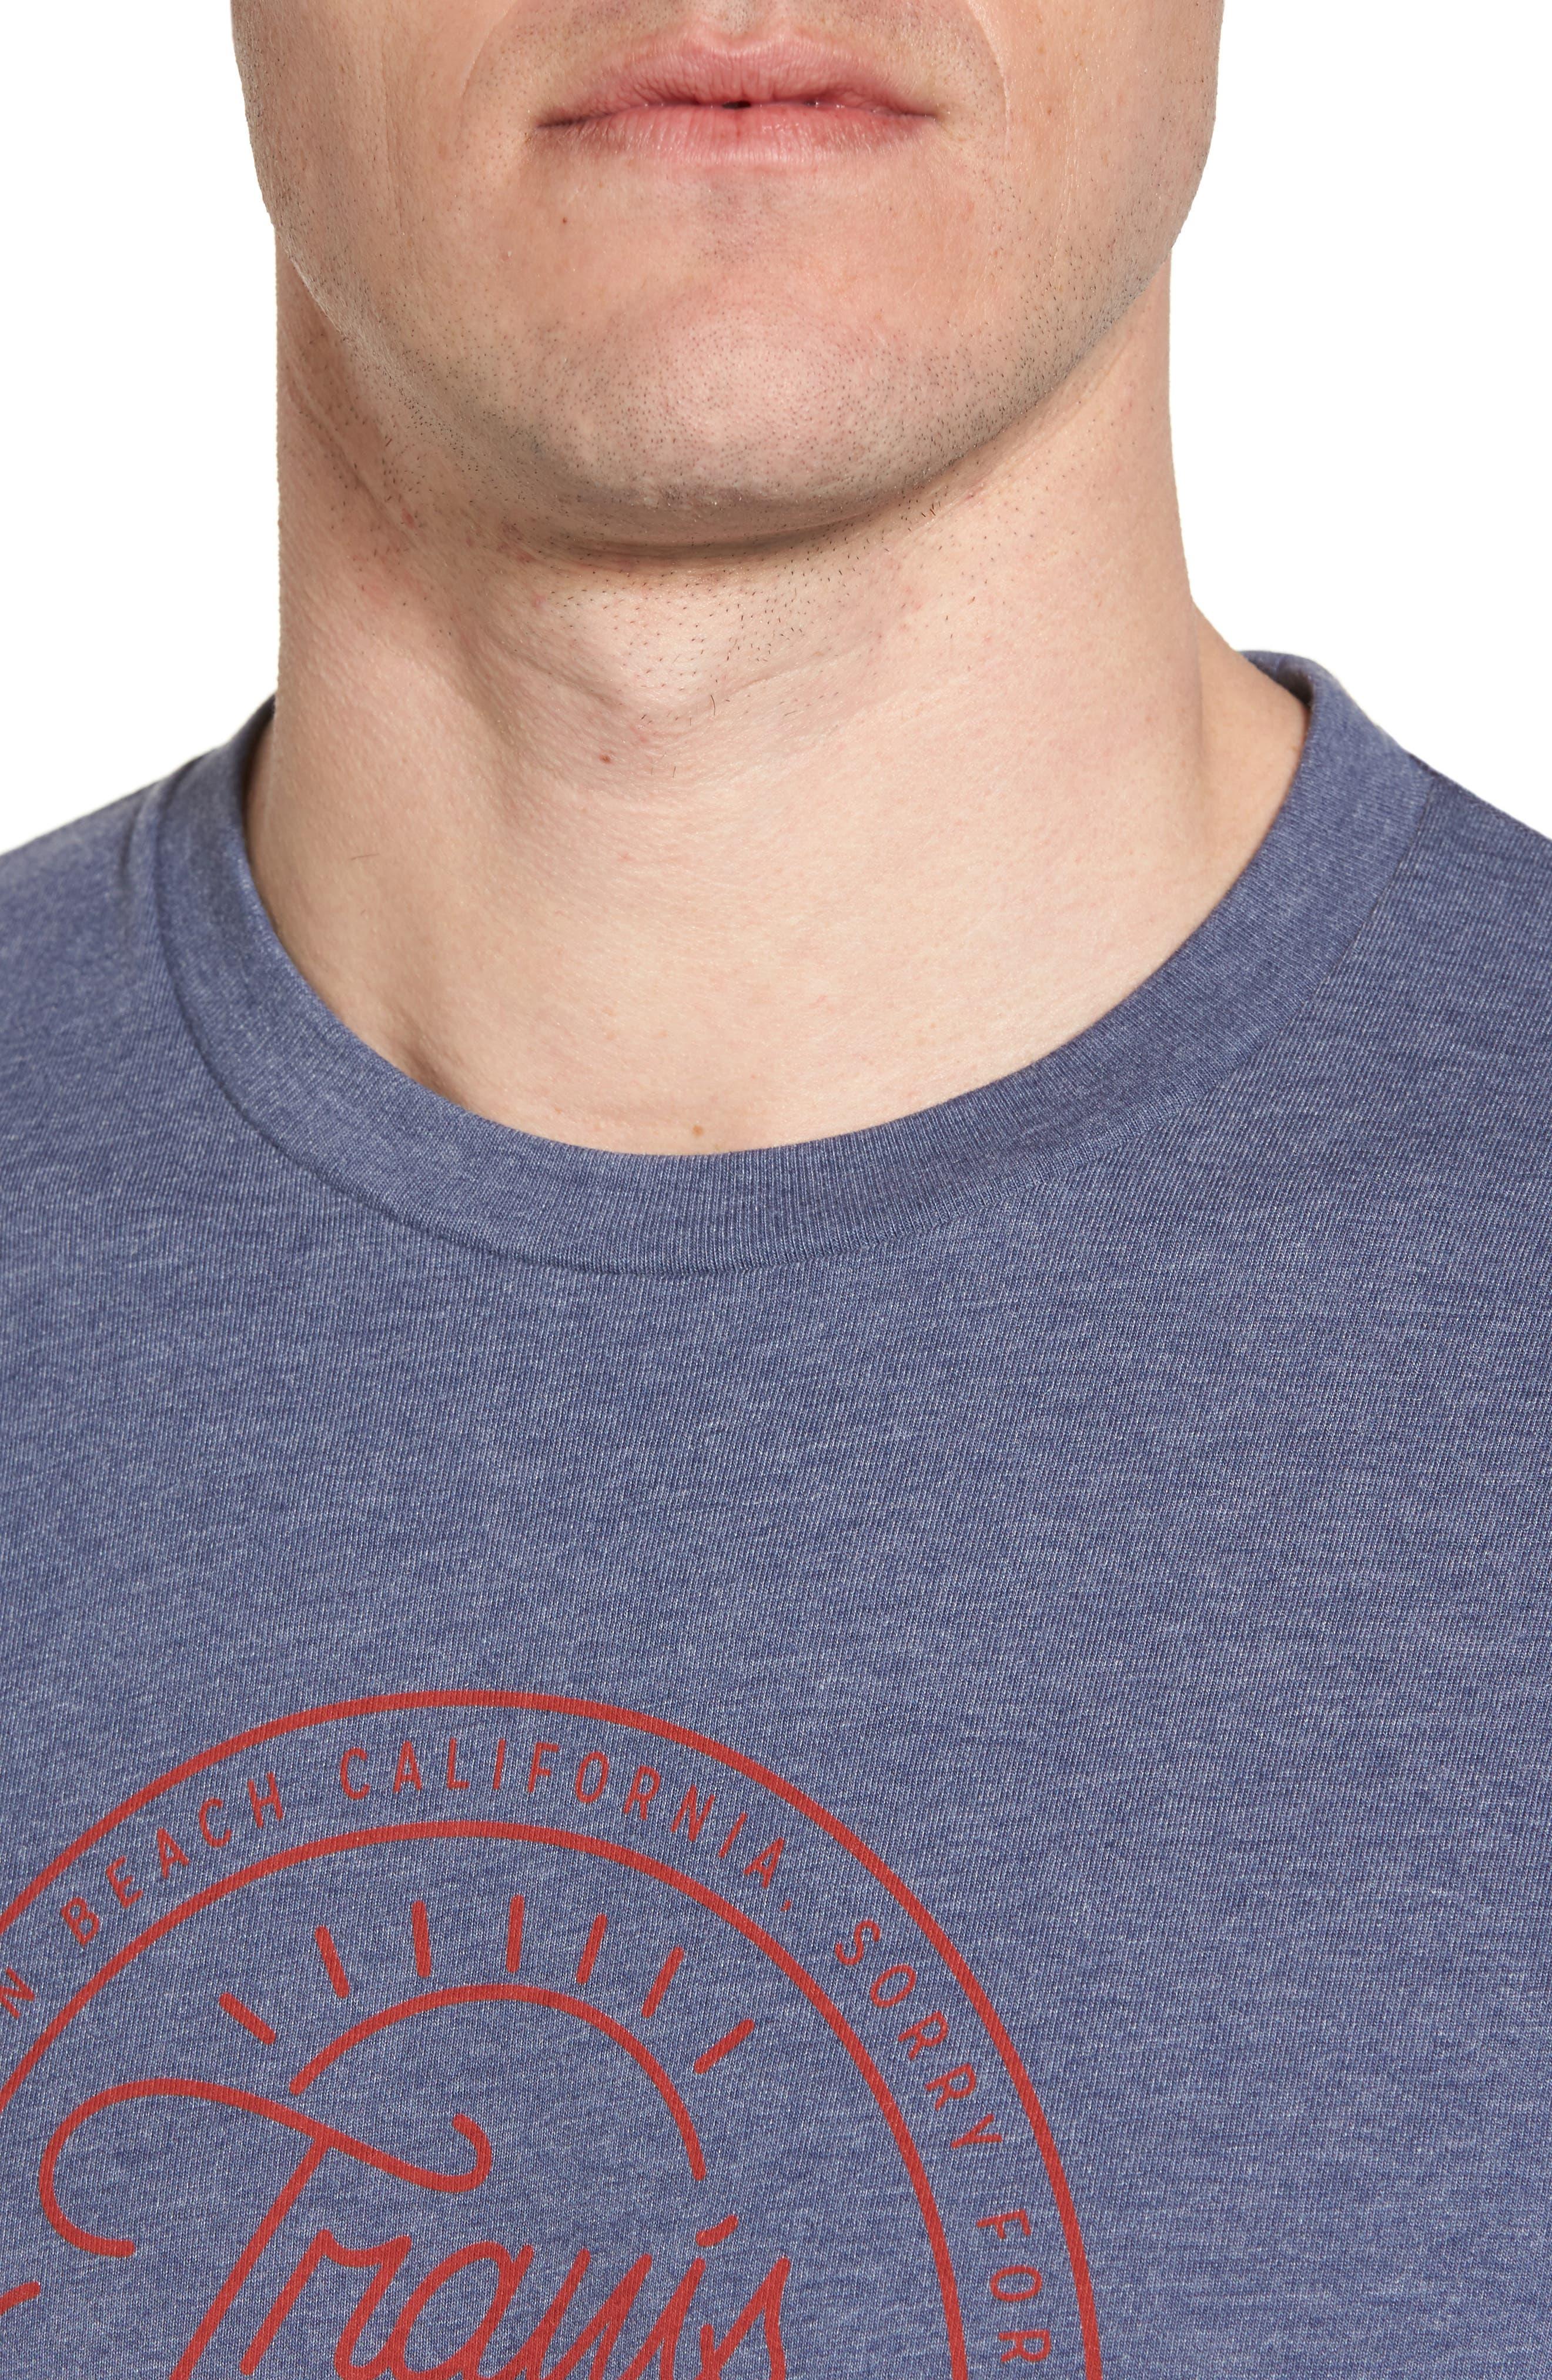 Drebo Graphic T-Shirt,                             Alternate thumbnail 4, color,                             Heather Blue Nights